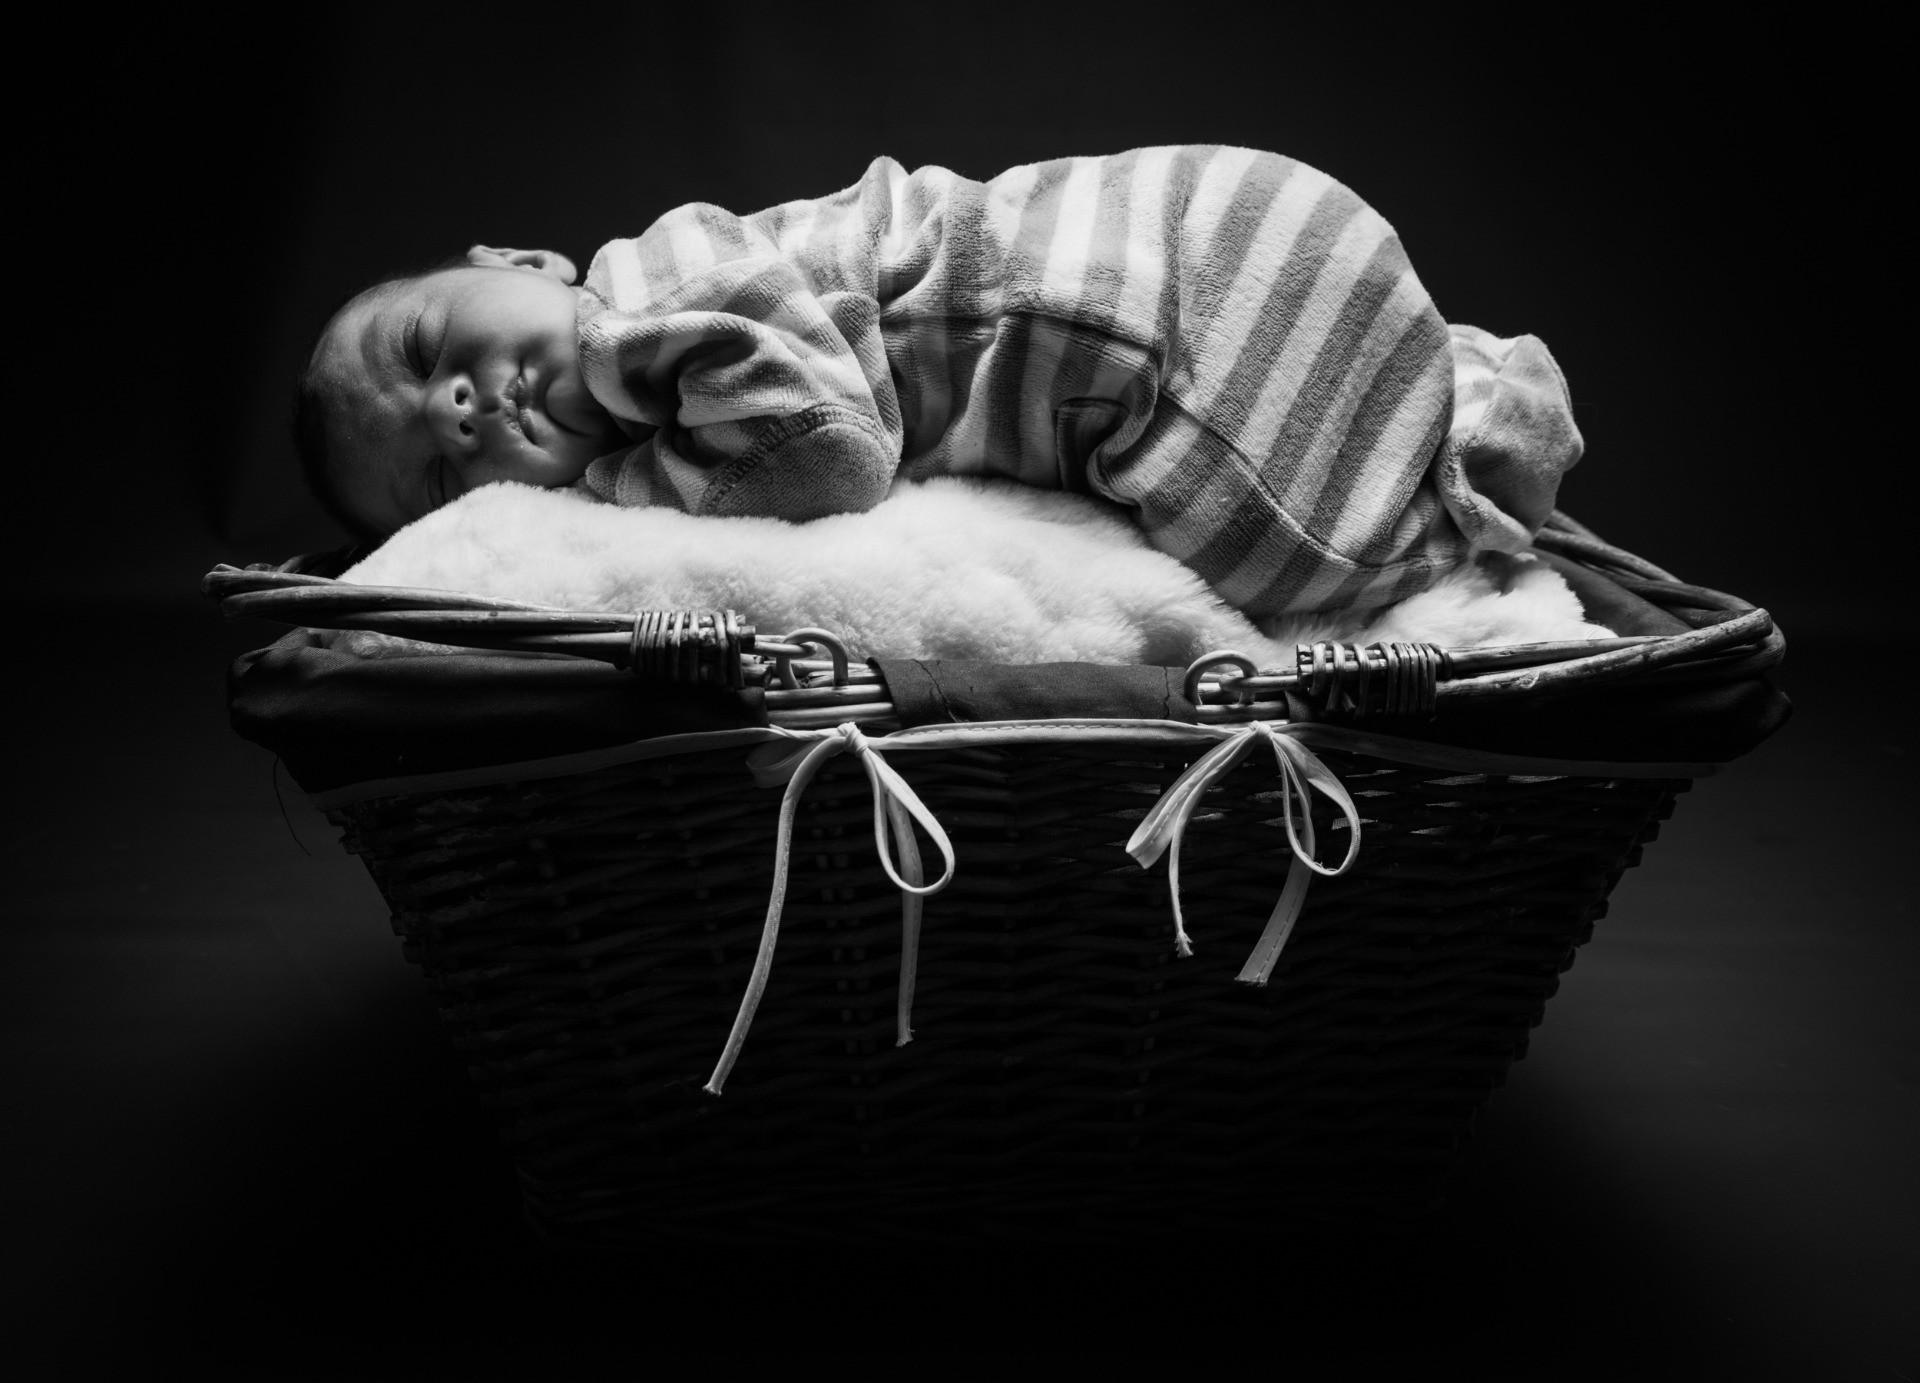 prestations/naissance/IMG_4017.jpg